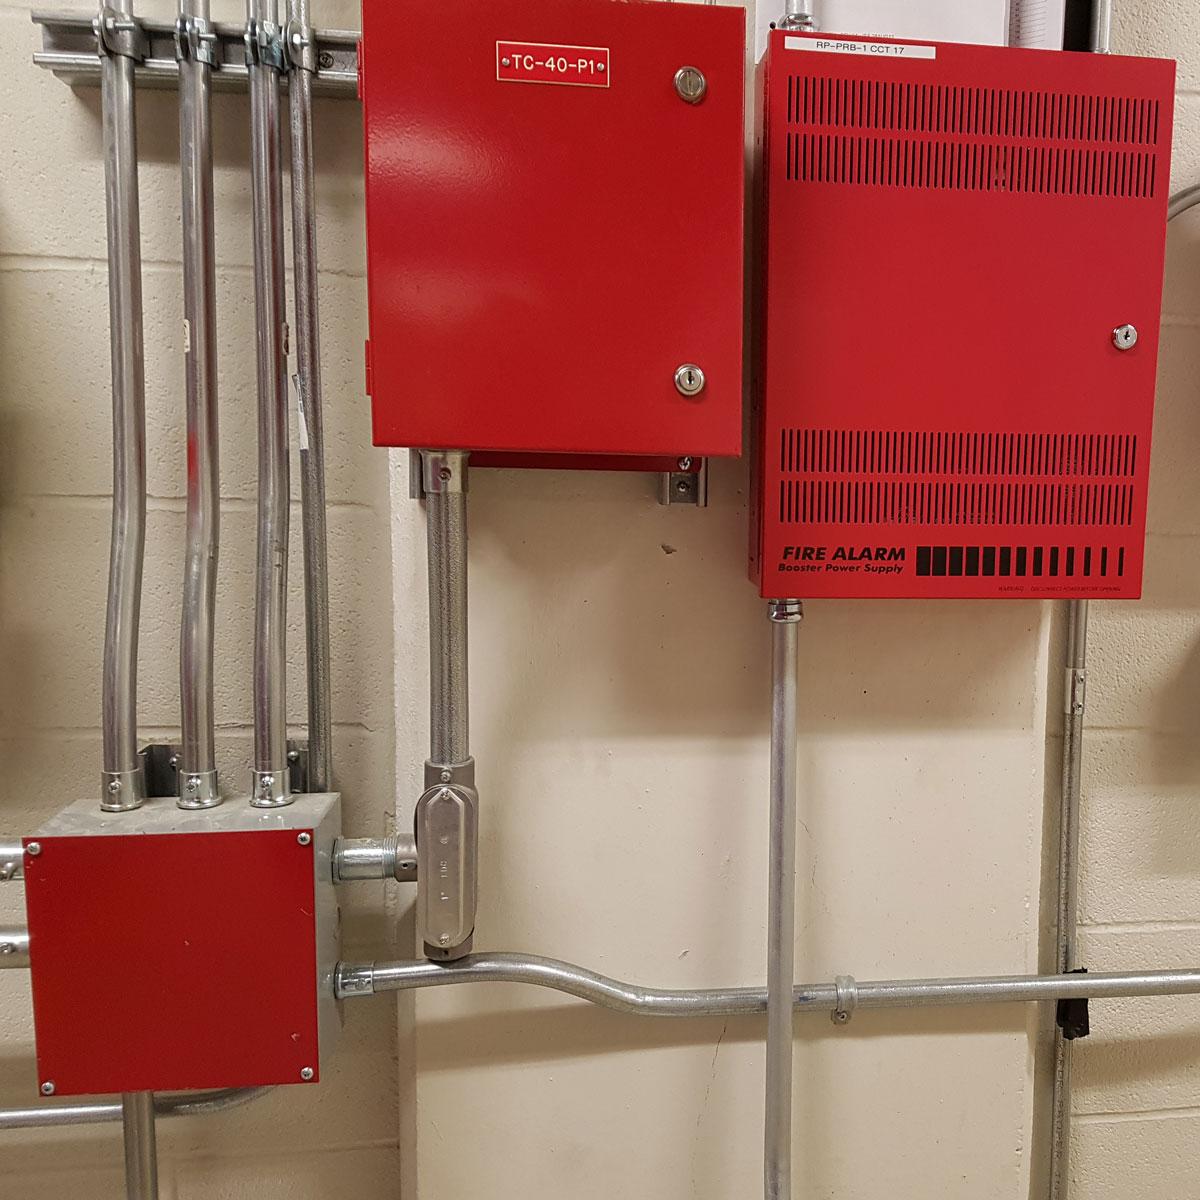 Electrical Service: Fire Alarm